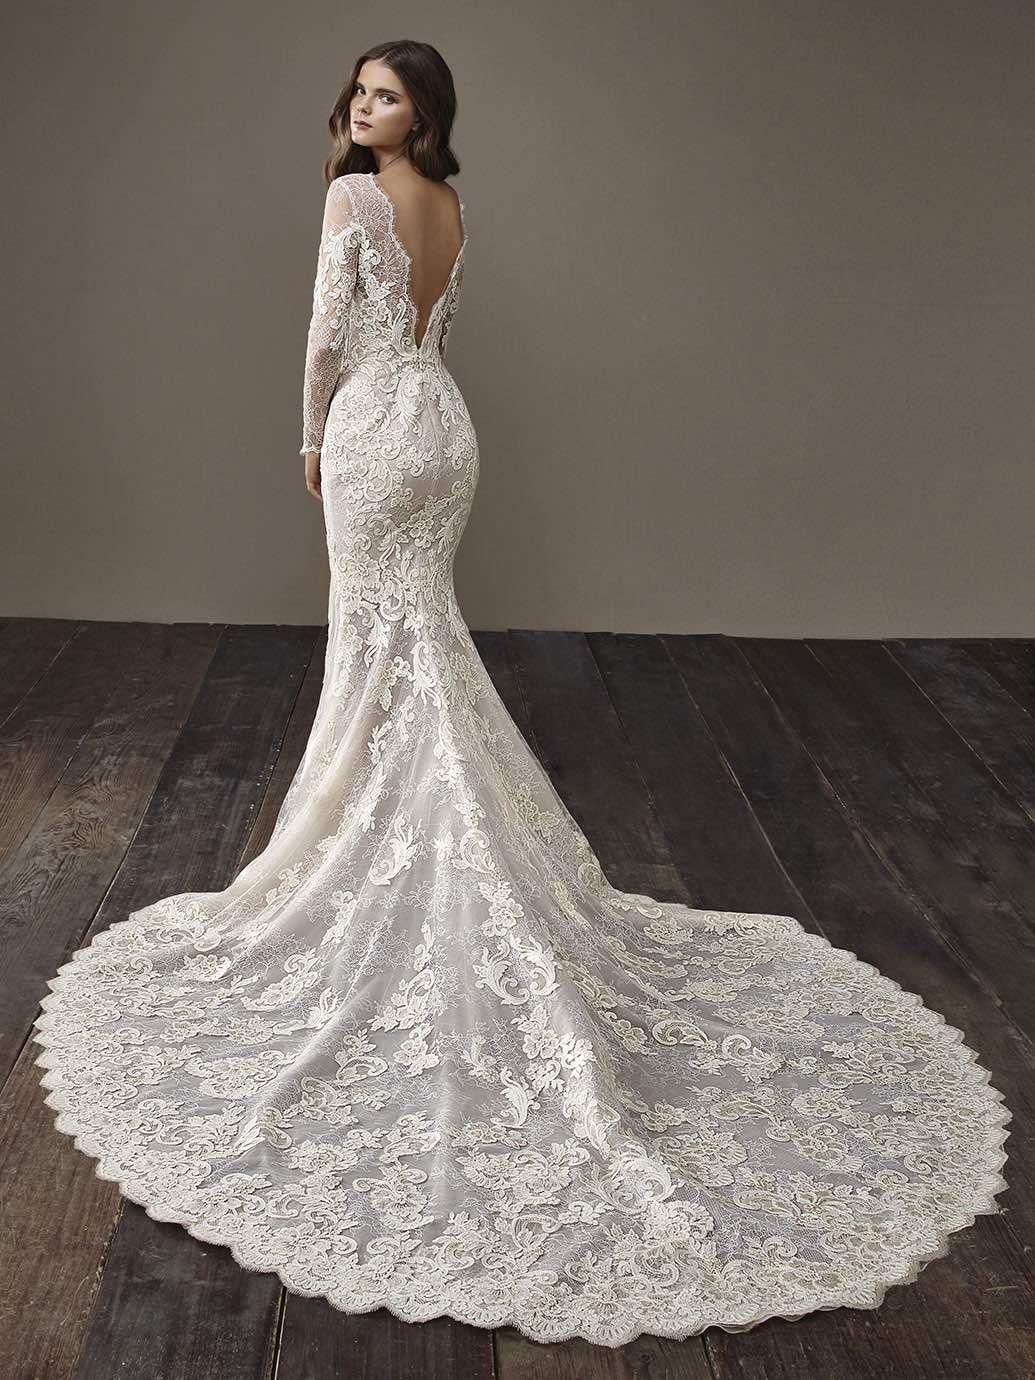 Glamorously Modern Badgley Mischka Wedding Dresses Bride Collection 2018 Modwedding Lacy Wedding Dresses Badgley Mischka Bridal Designer Wedding Dresses [ 1380 x 1035 Pixel ]